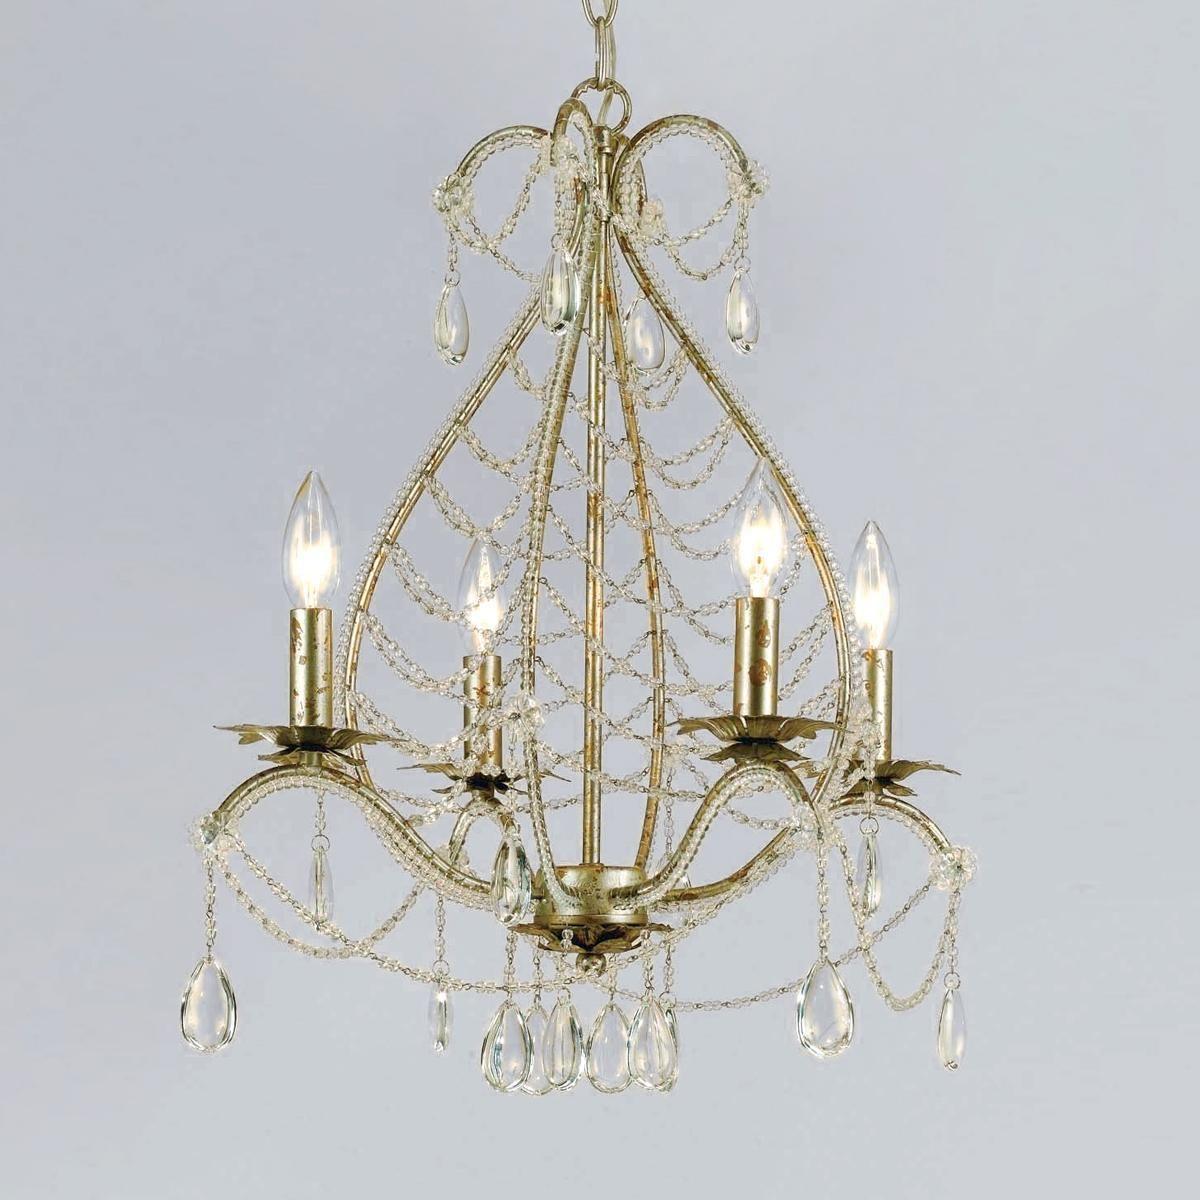 teardrop beading mini chandelier shades of light front